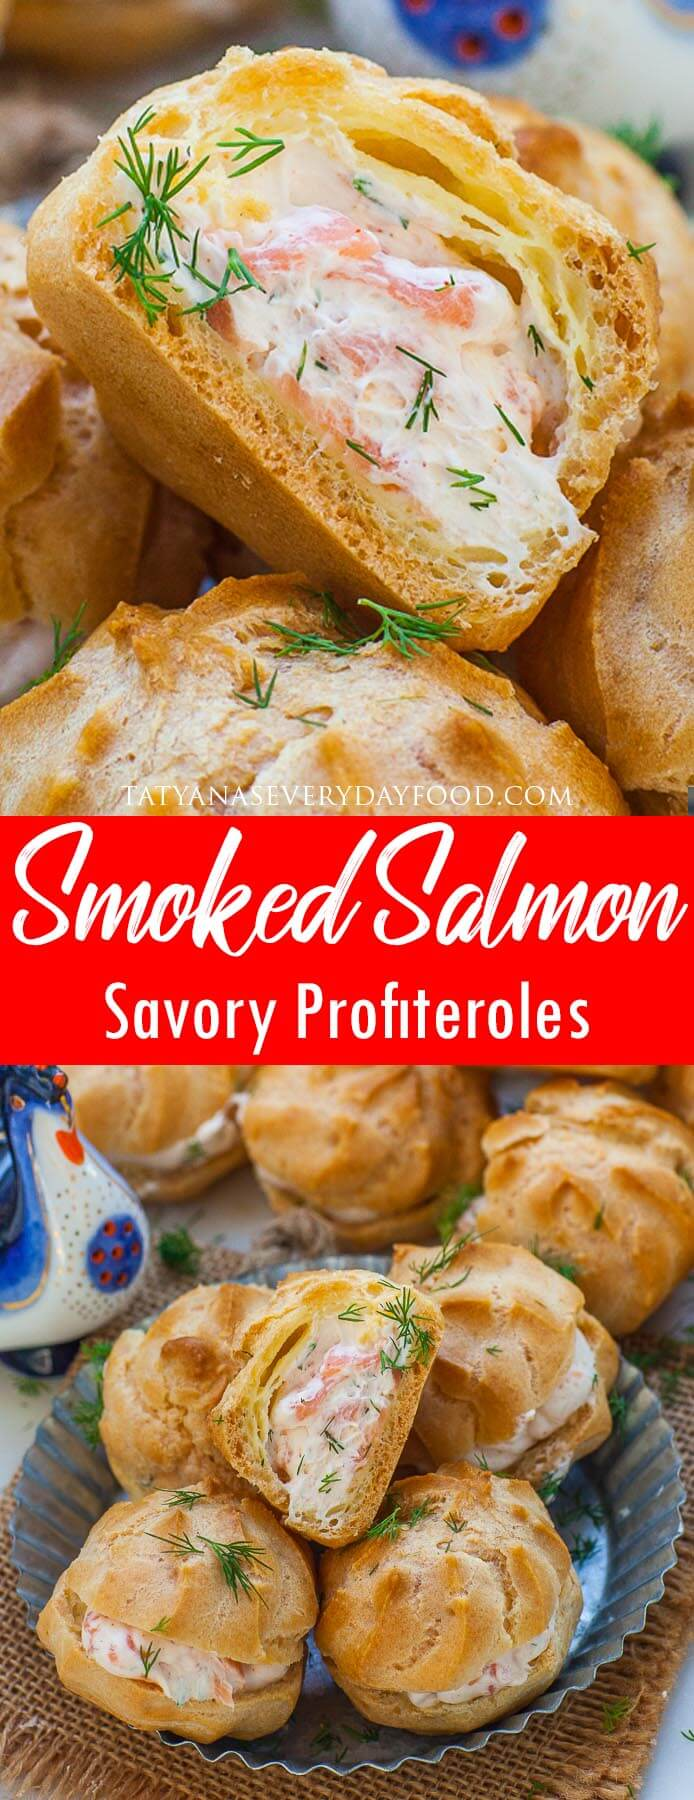 Smoked Salmon Puffs video recipe